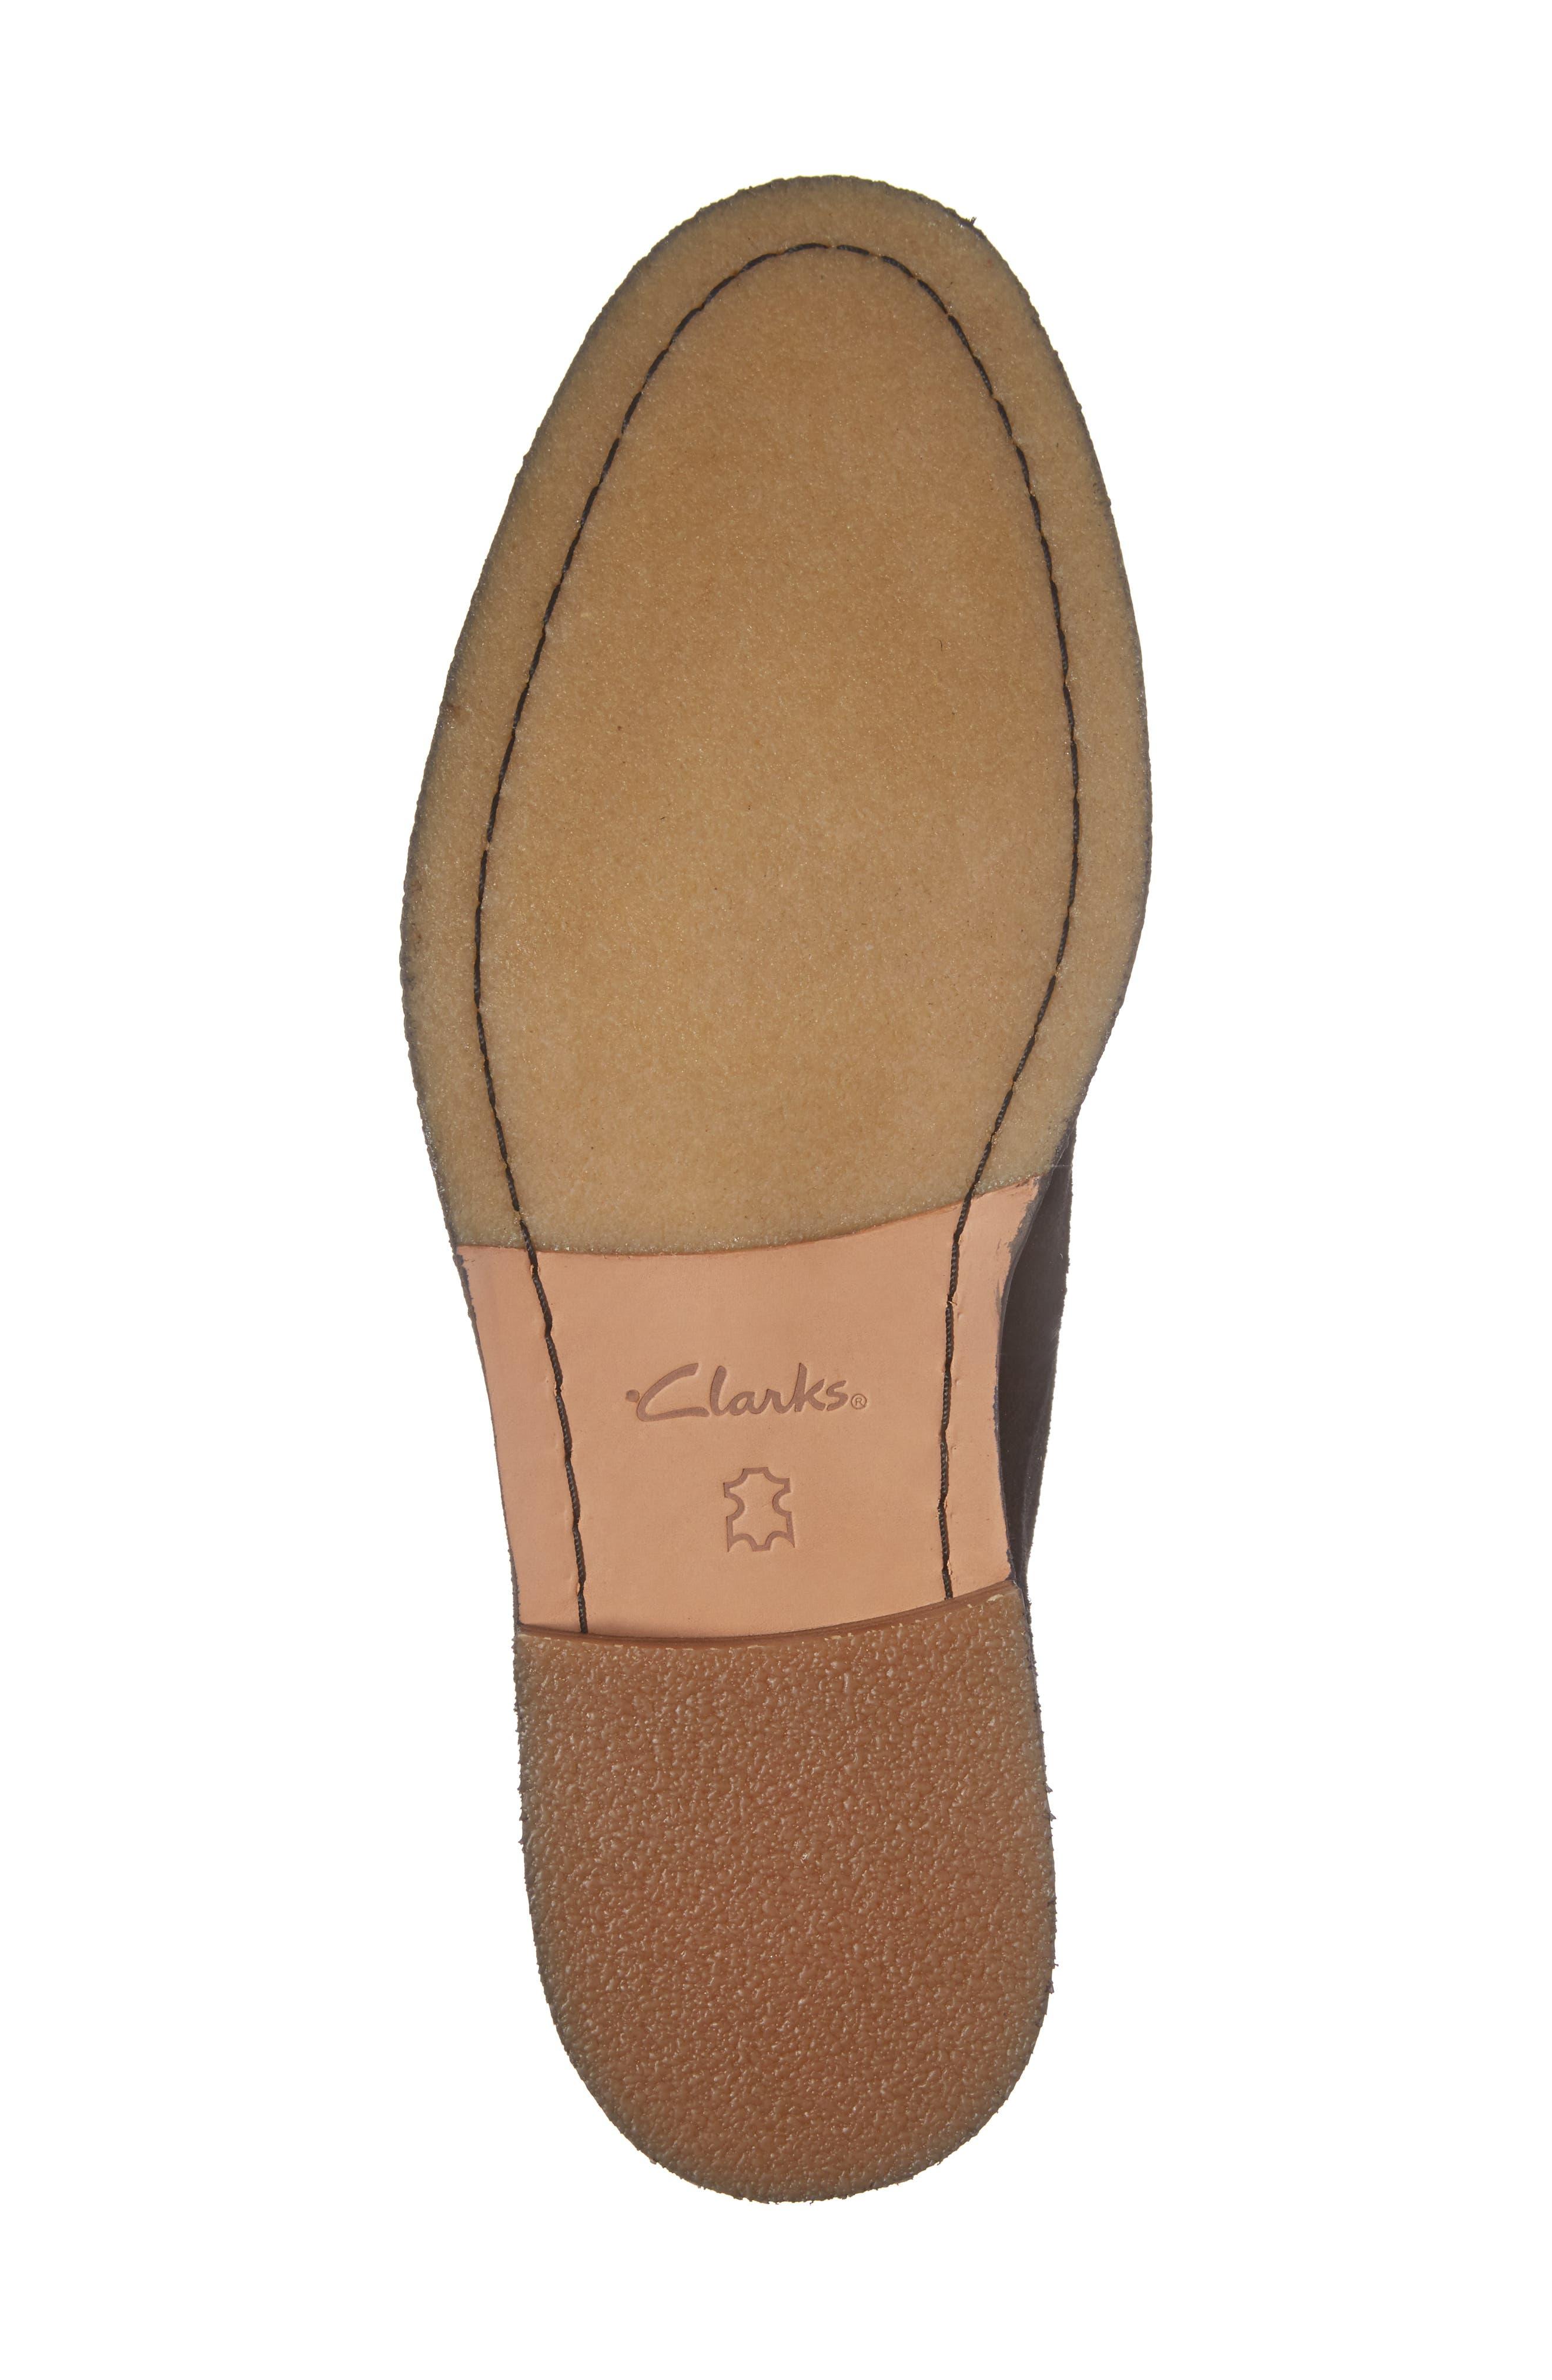 Clarks Clarkdale Moon Buck Shoe,                             Alternate thumbnail 6, color,                             Black Suede